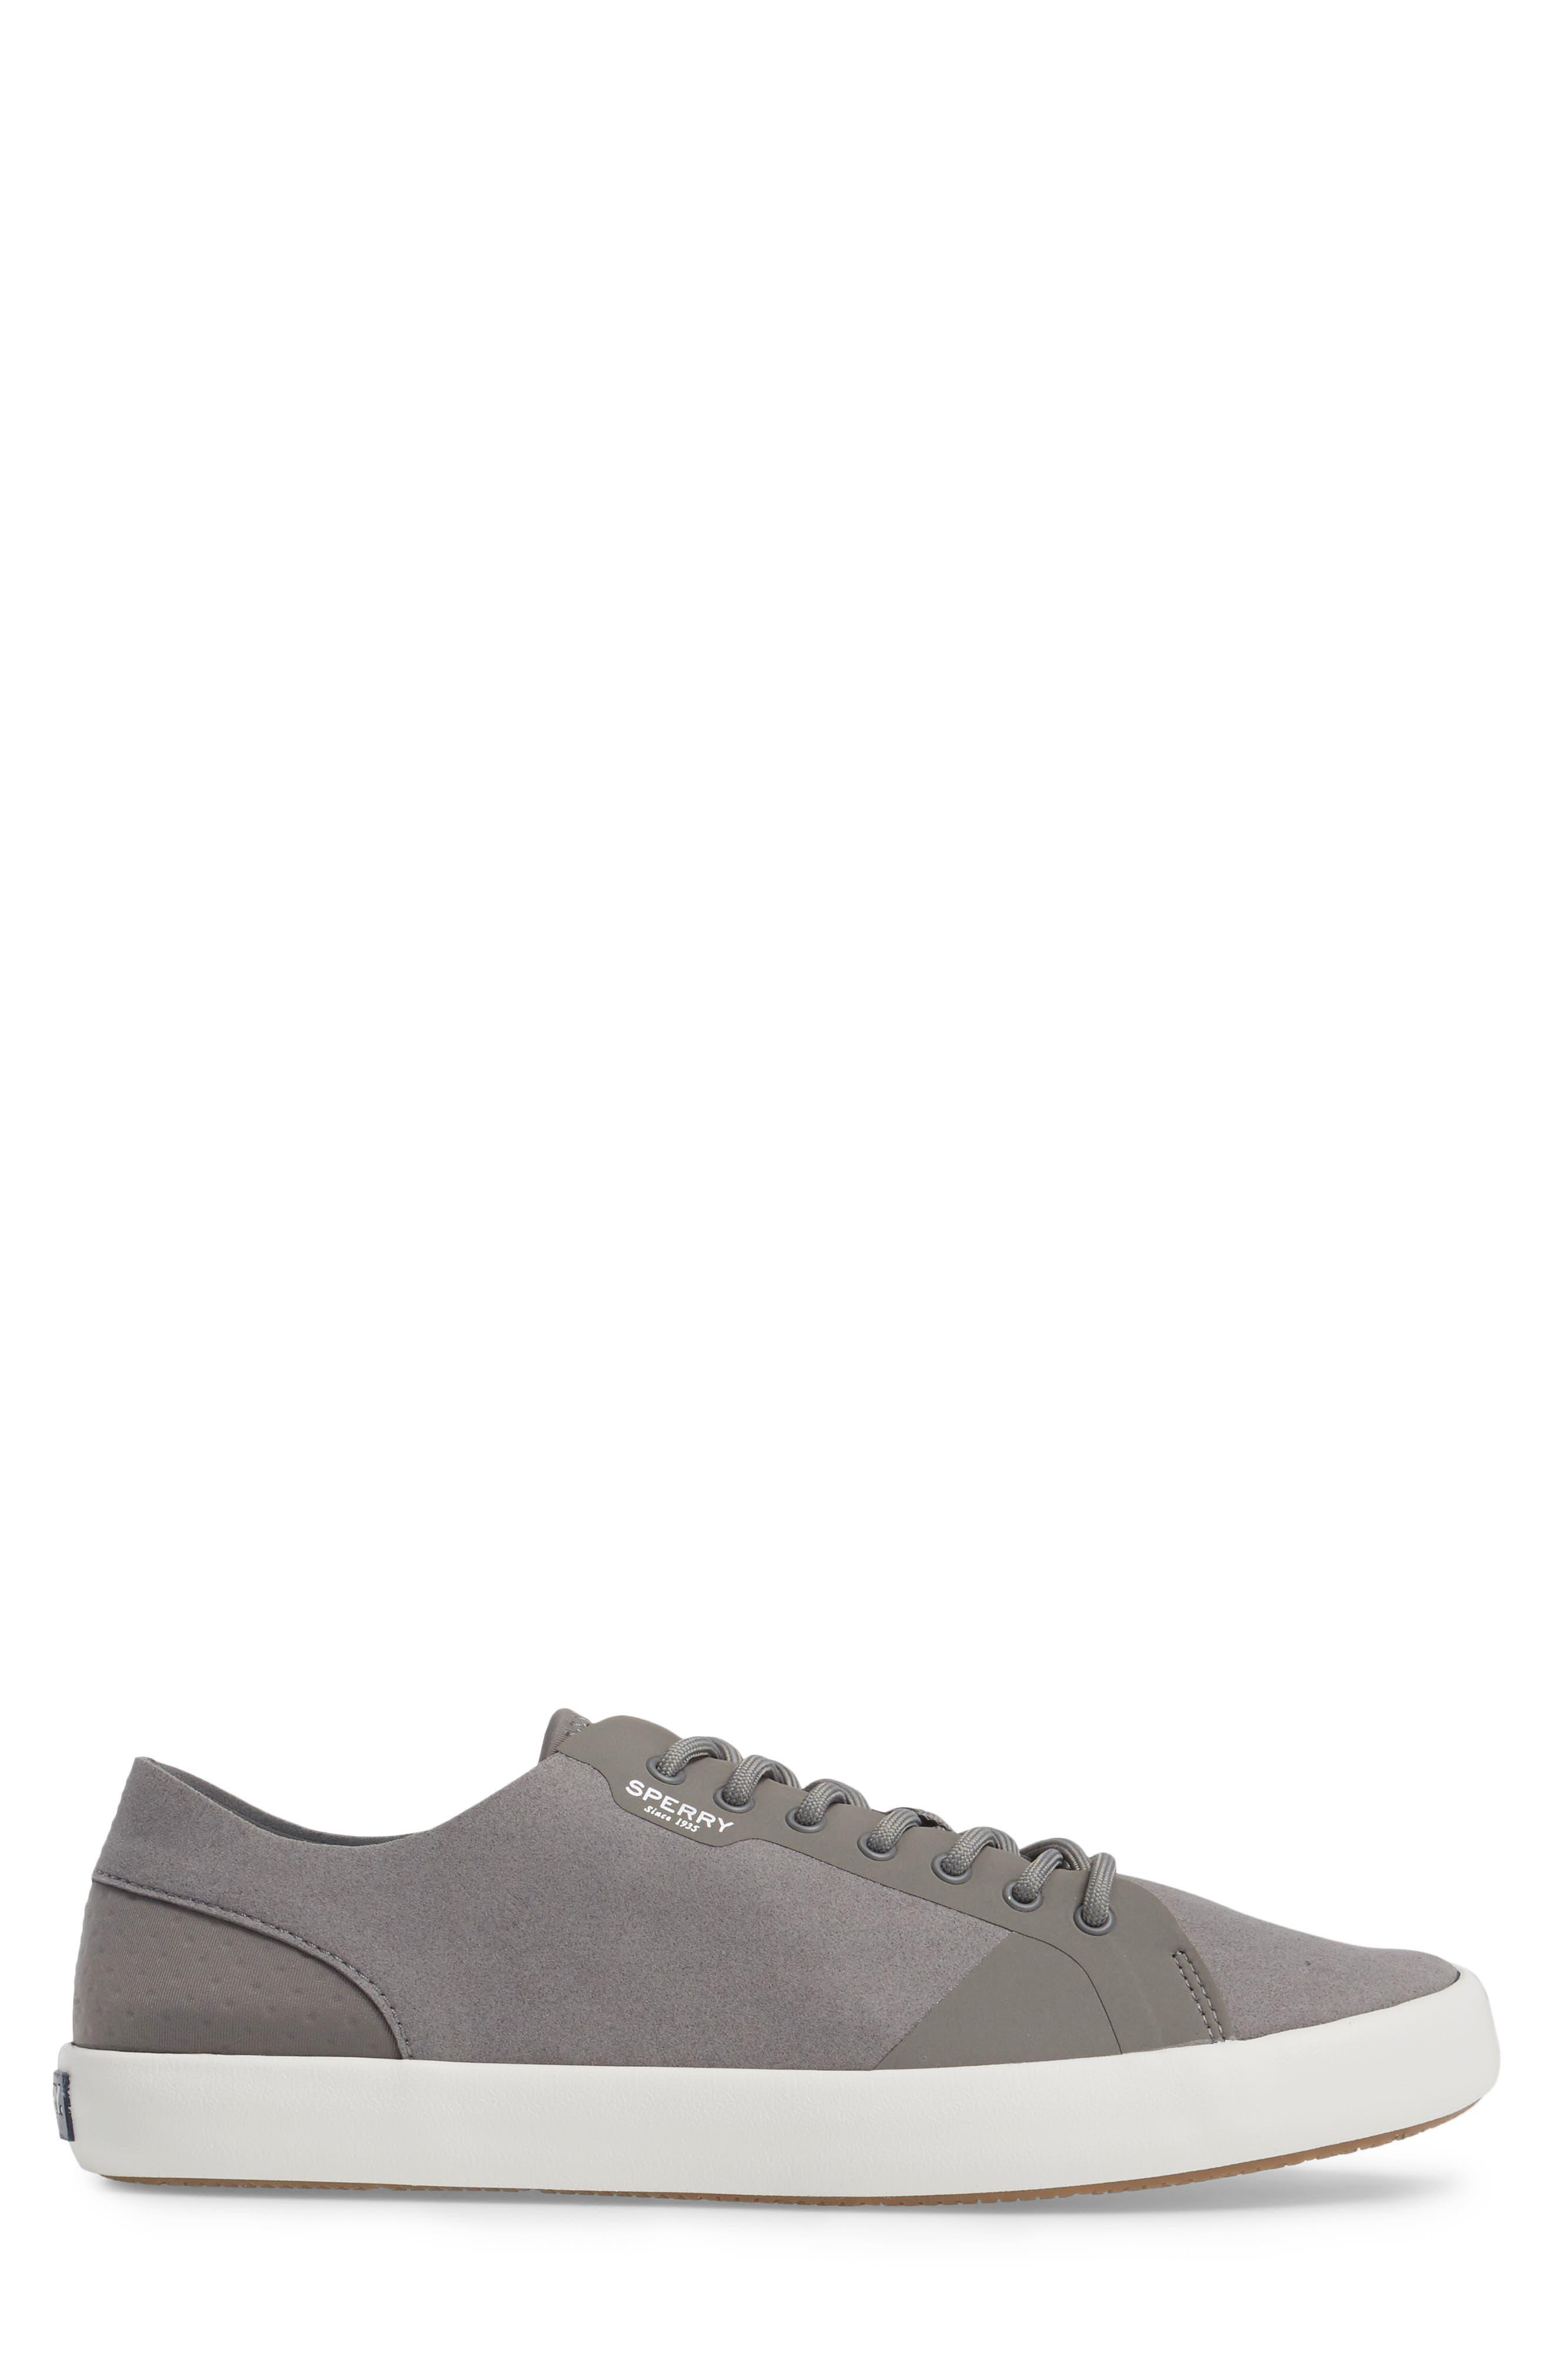 Flex Deck LTT Sneaker,                             Alternate thumbnail 3, color,                             Grey